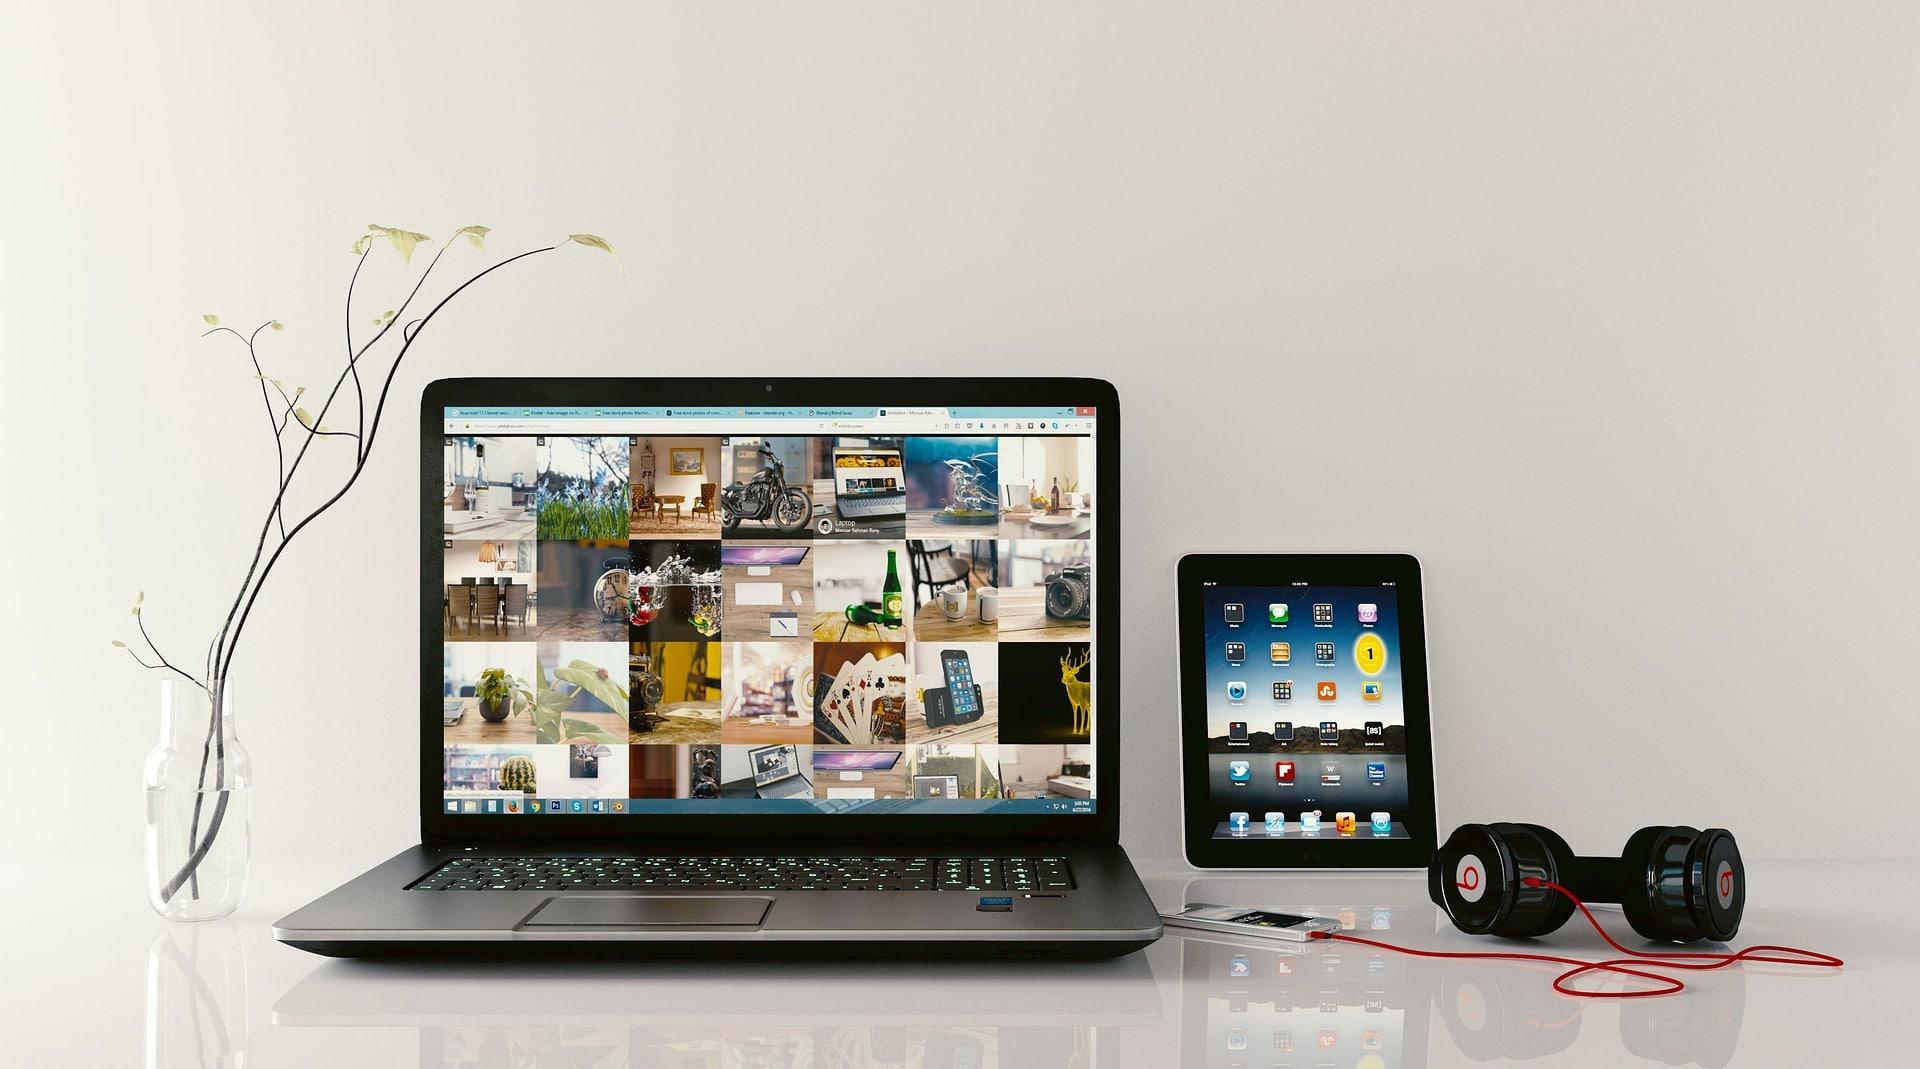 Tablet o Laptop?